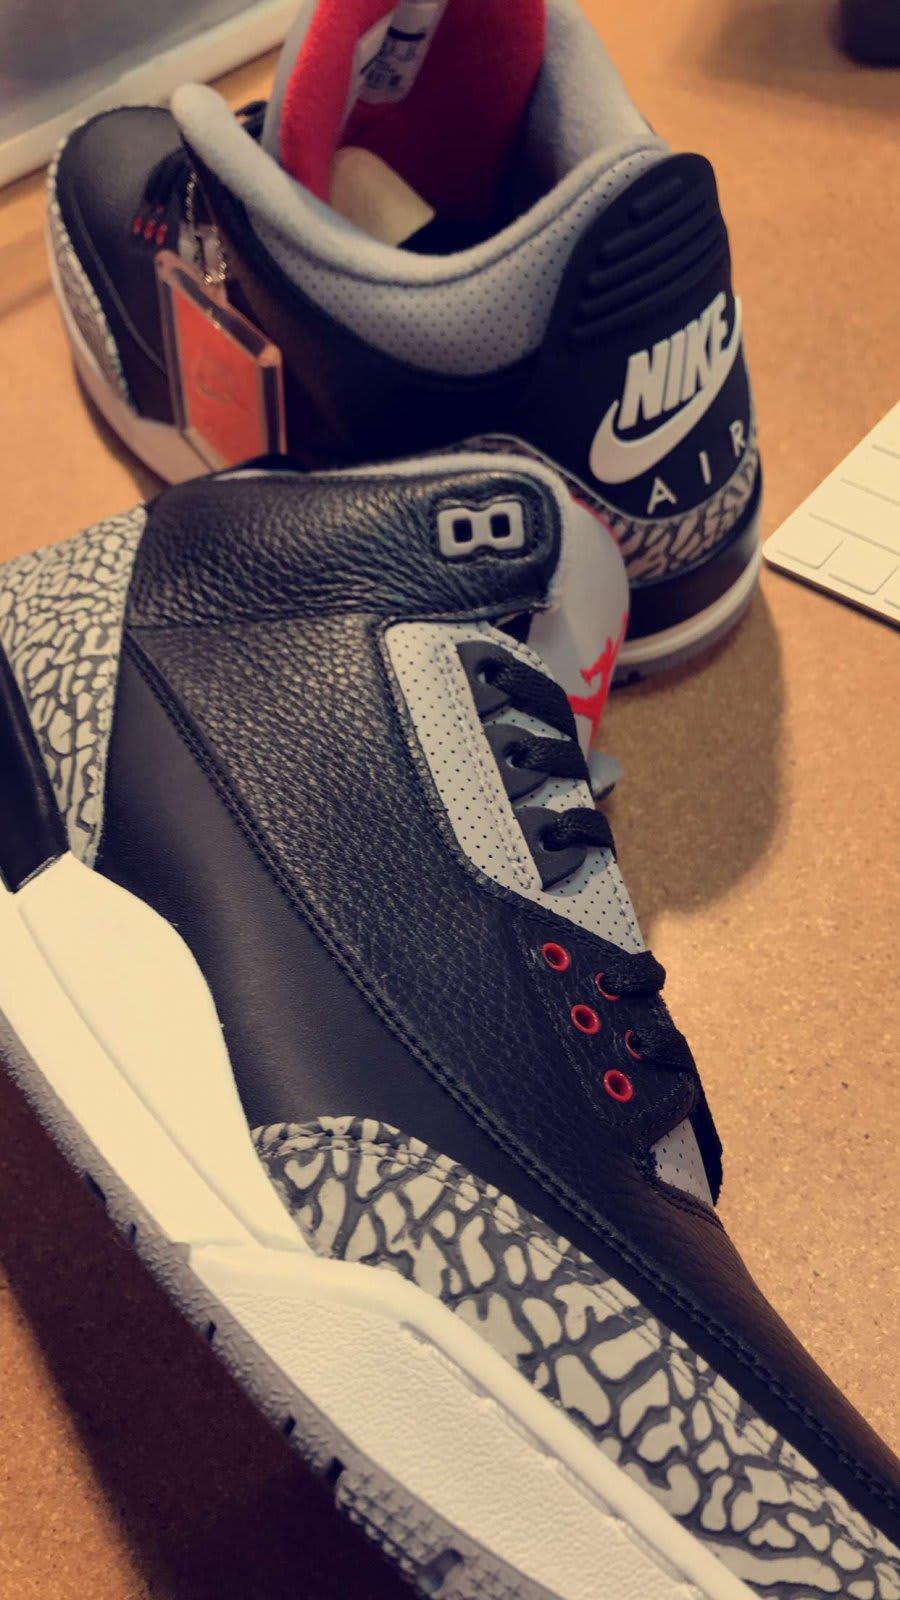 b491cb13460ac5 reduced j.r smith rocking air jordan black cement iii sneakers e793f 9d56c   where can i buy air jordan 3 black cement 2018 release date 854262 001  73f94 ...